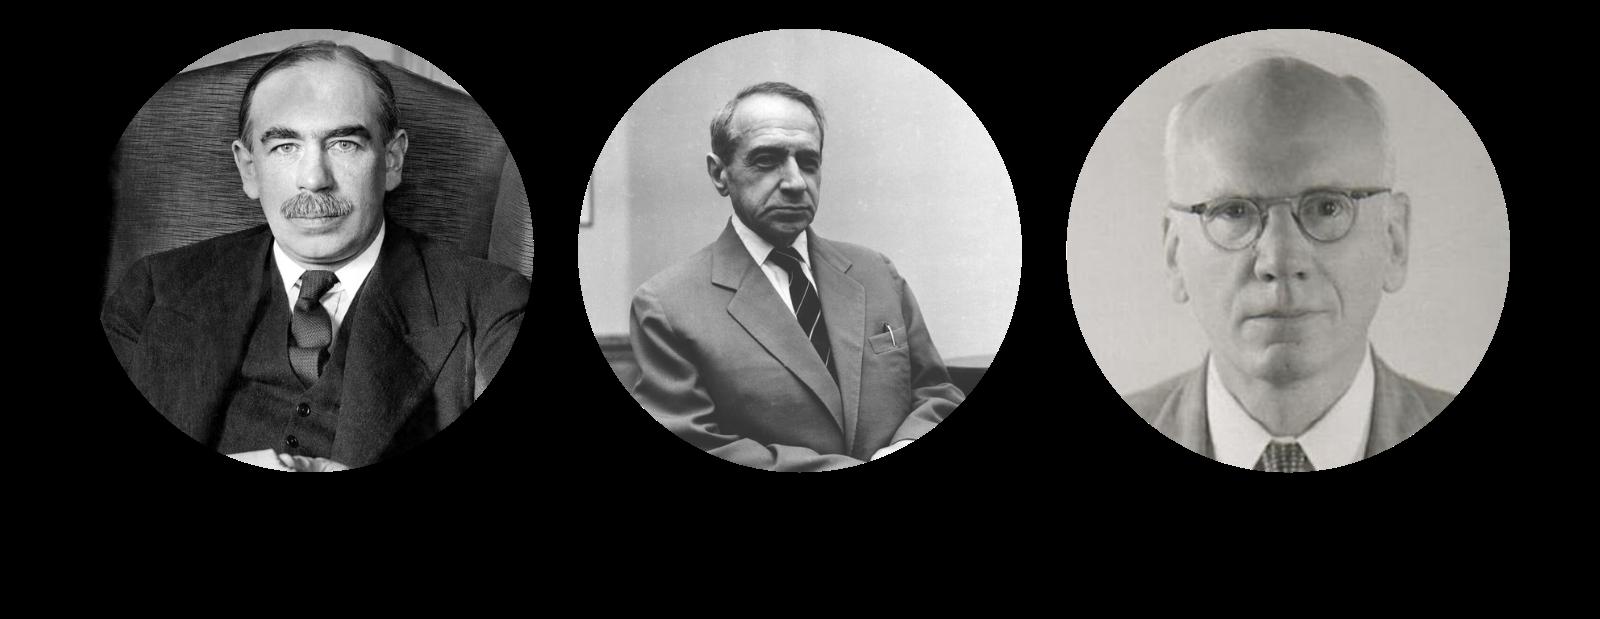 John Maynard Keynes, Michal Kalecki and Morris Copeland set the wheels in motion for the Stock-Flow Modelling approach